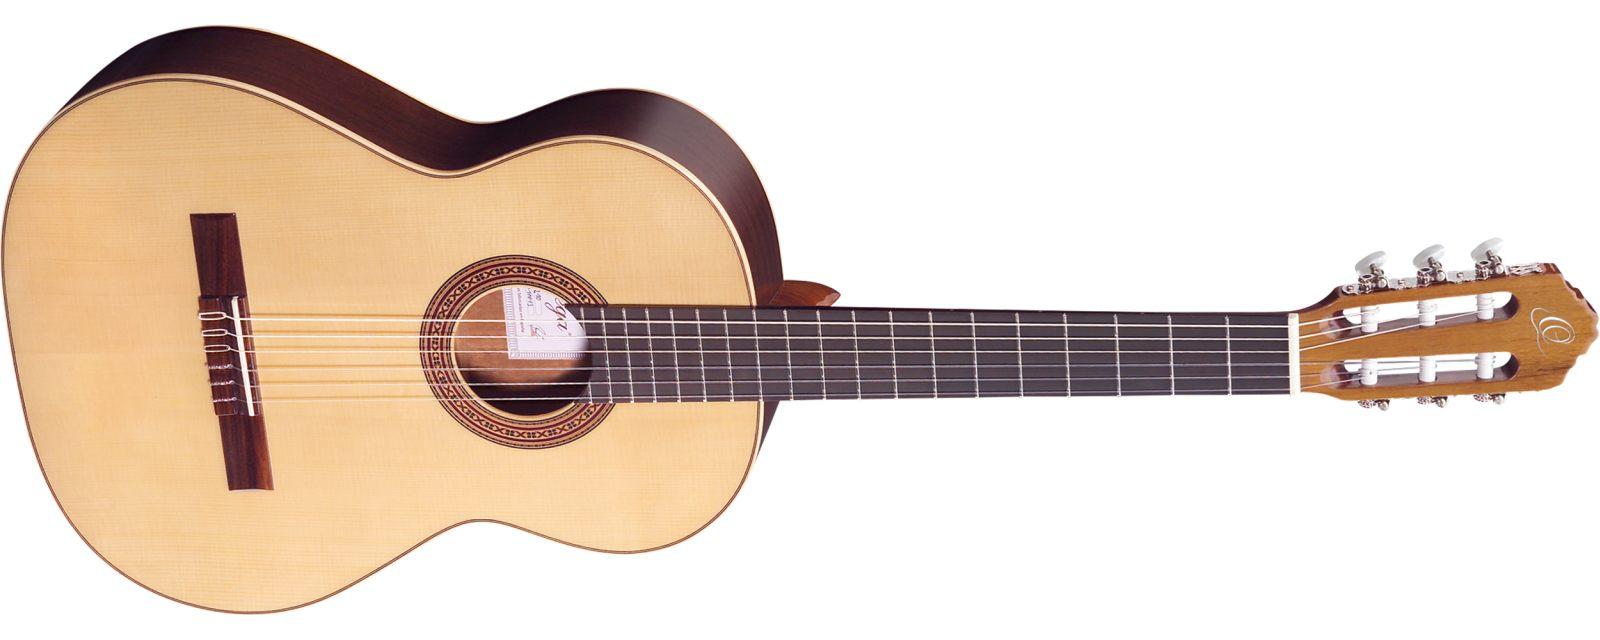 Ortega R-210 Konzertgitarre